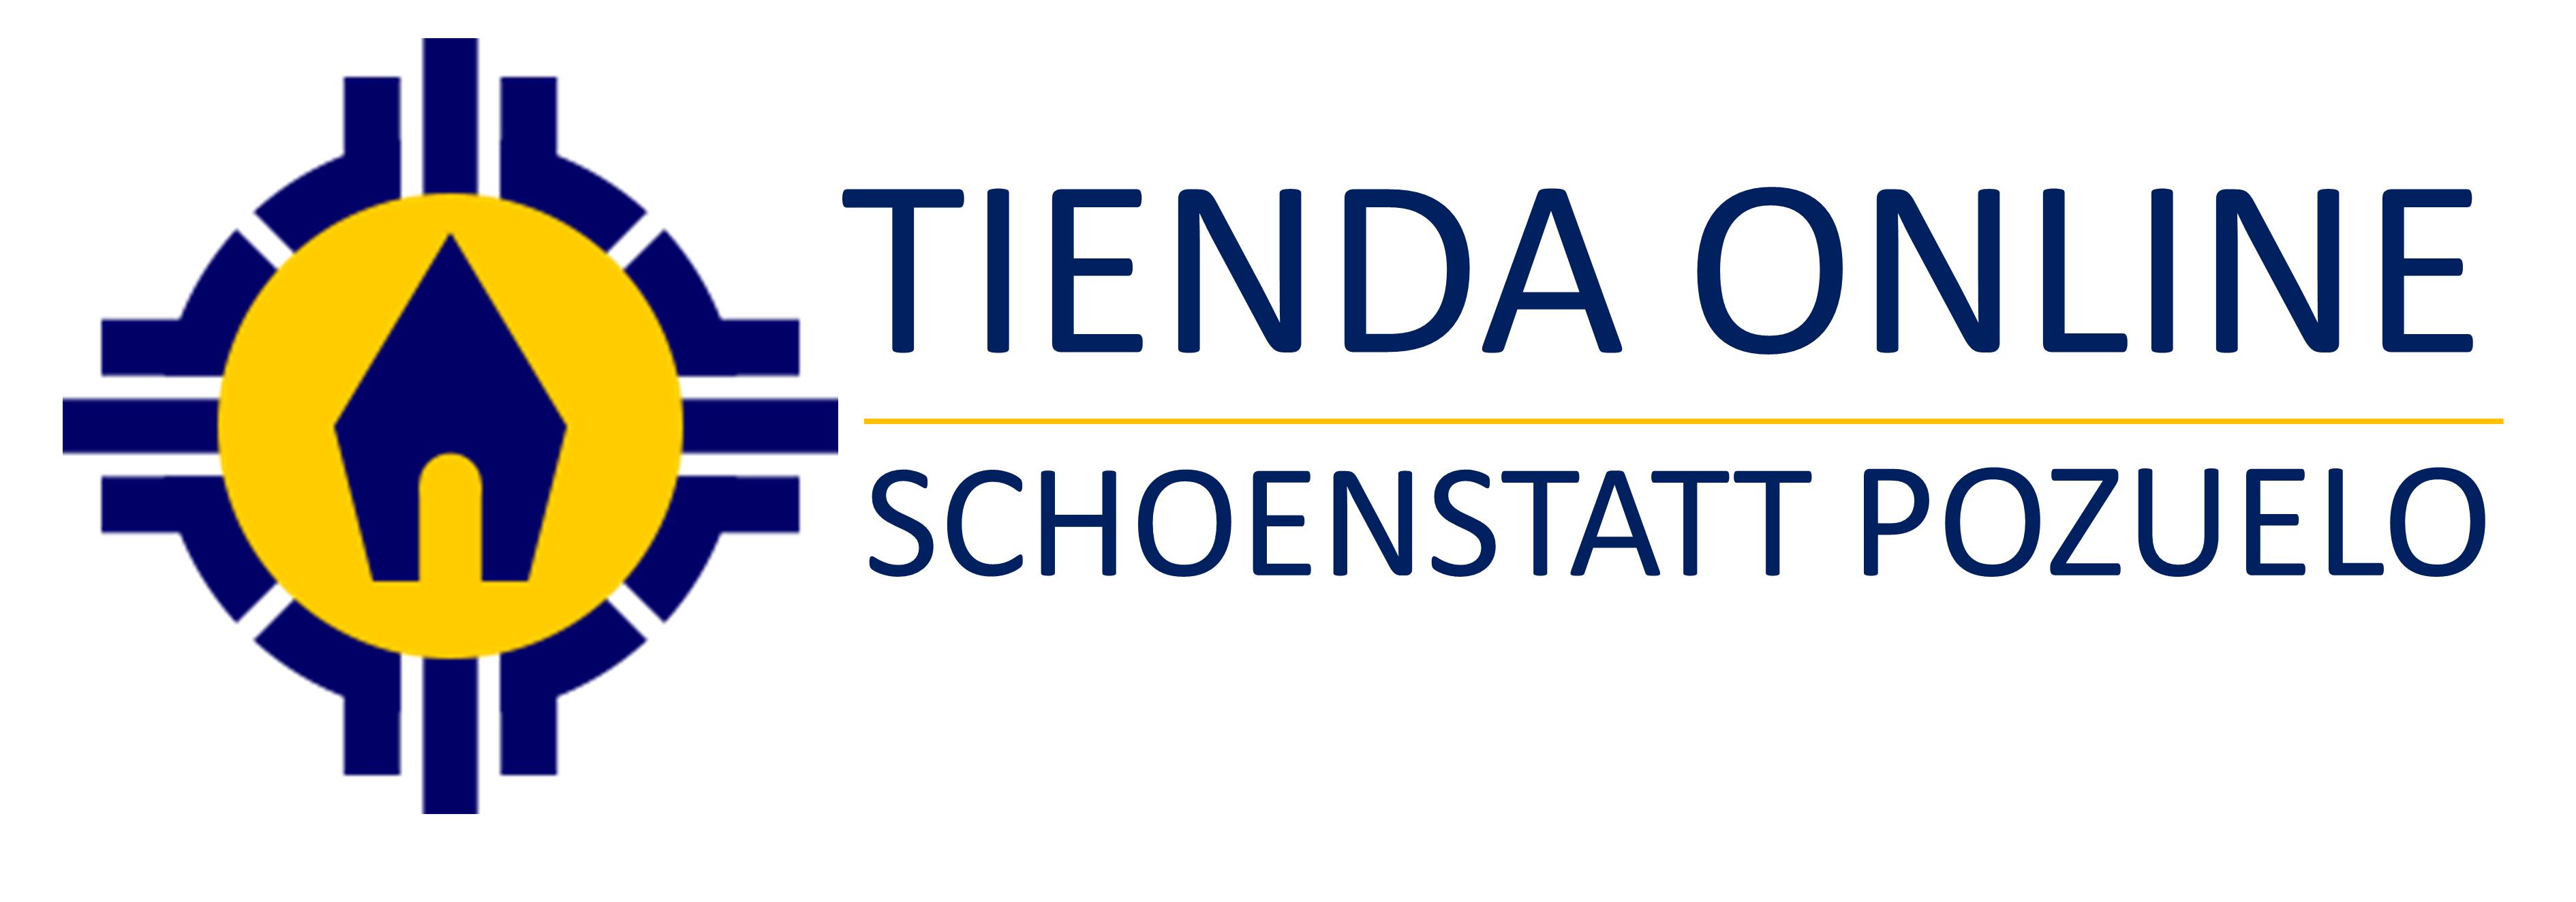 Tienda Schoenstatt Pozuelo